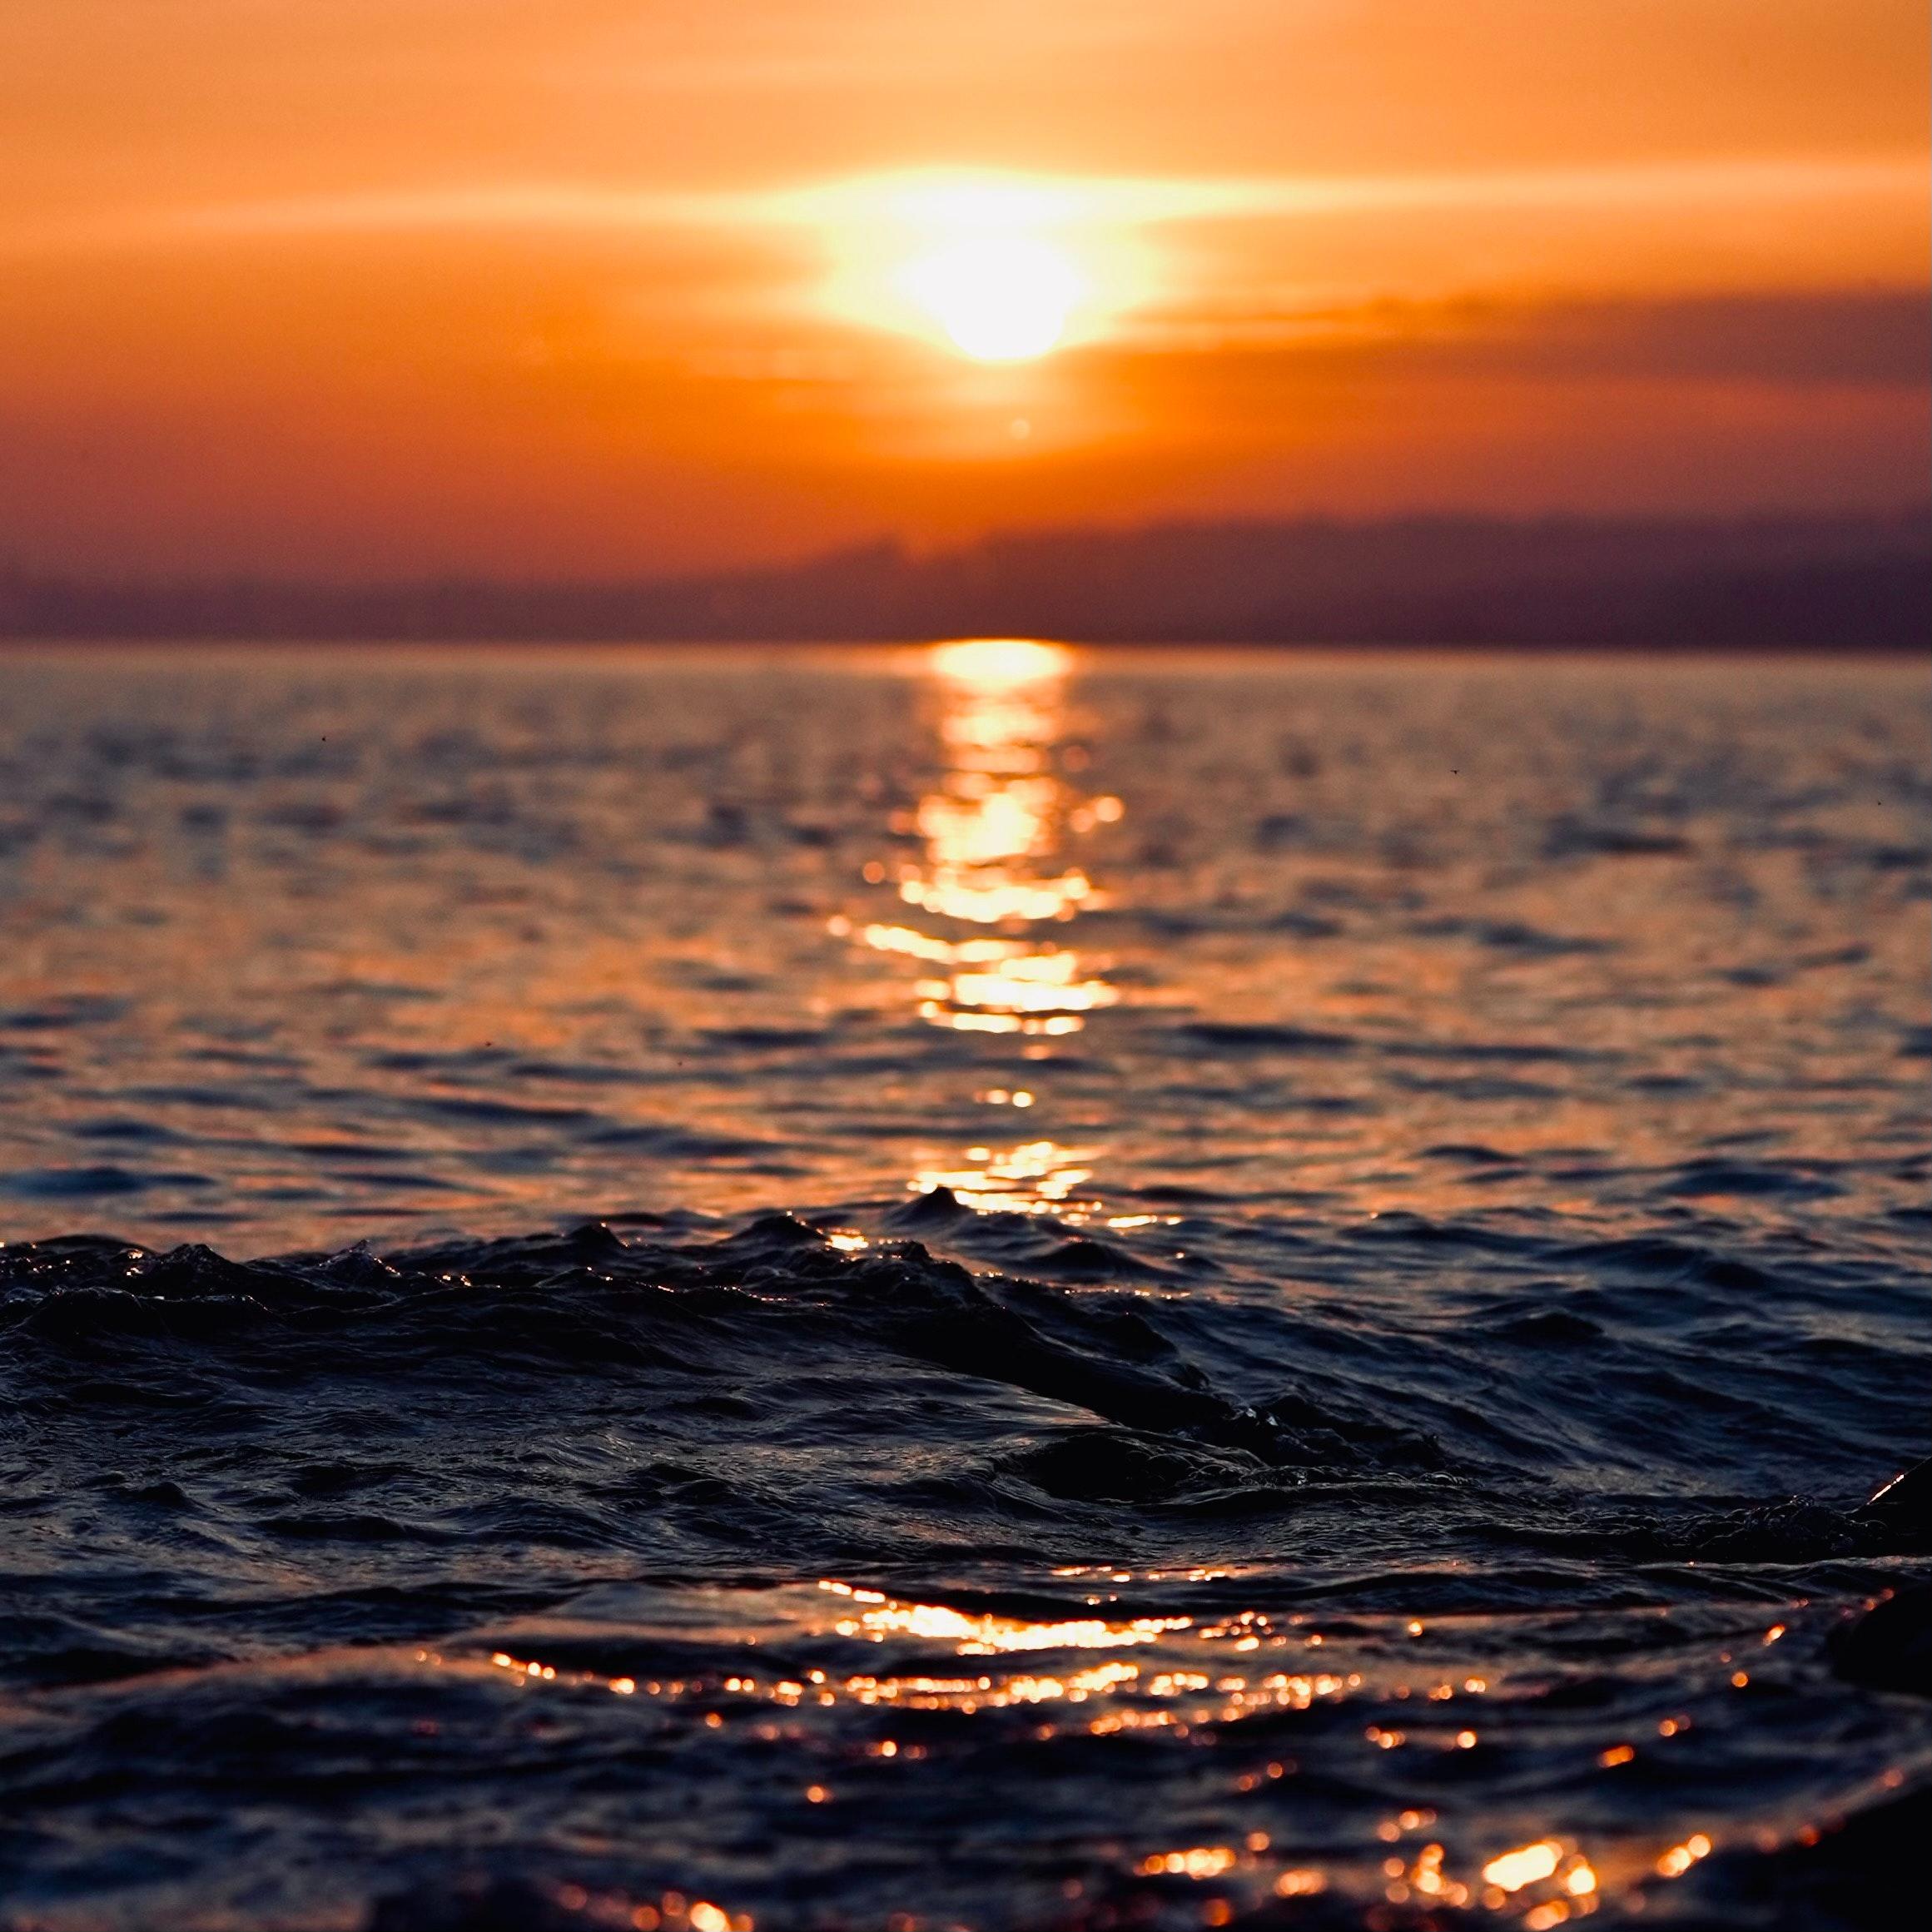 Atardecer que tiñe el mar de colores calidos